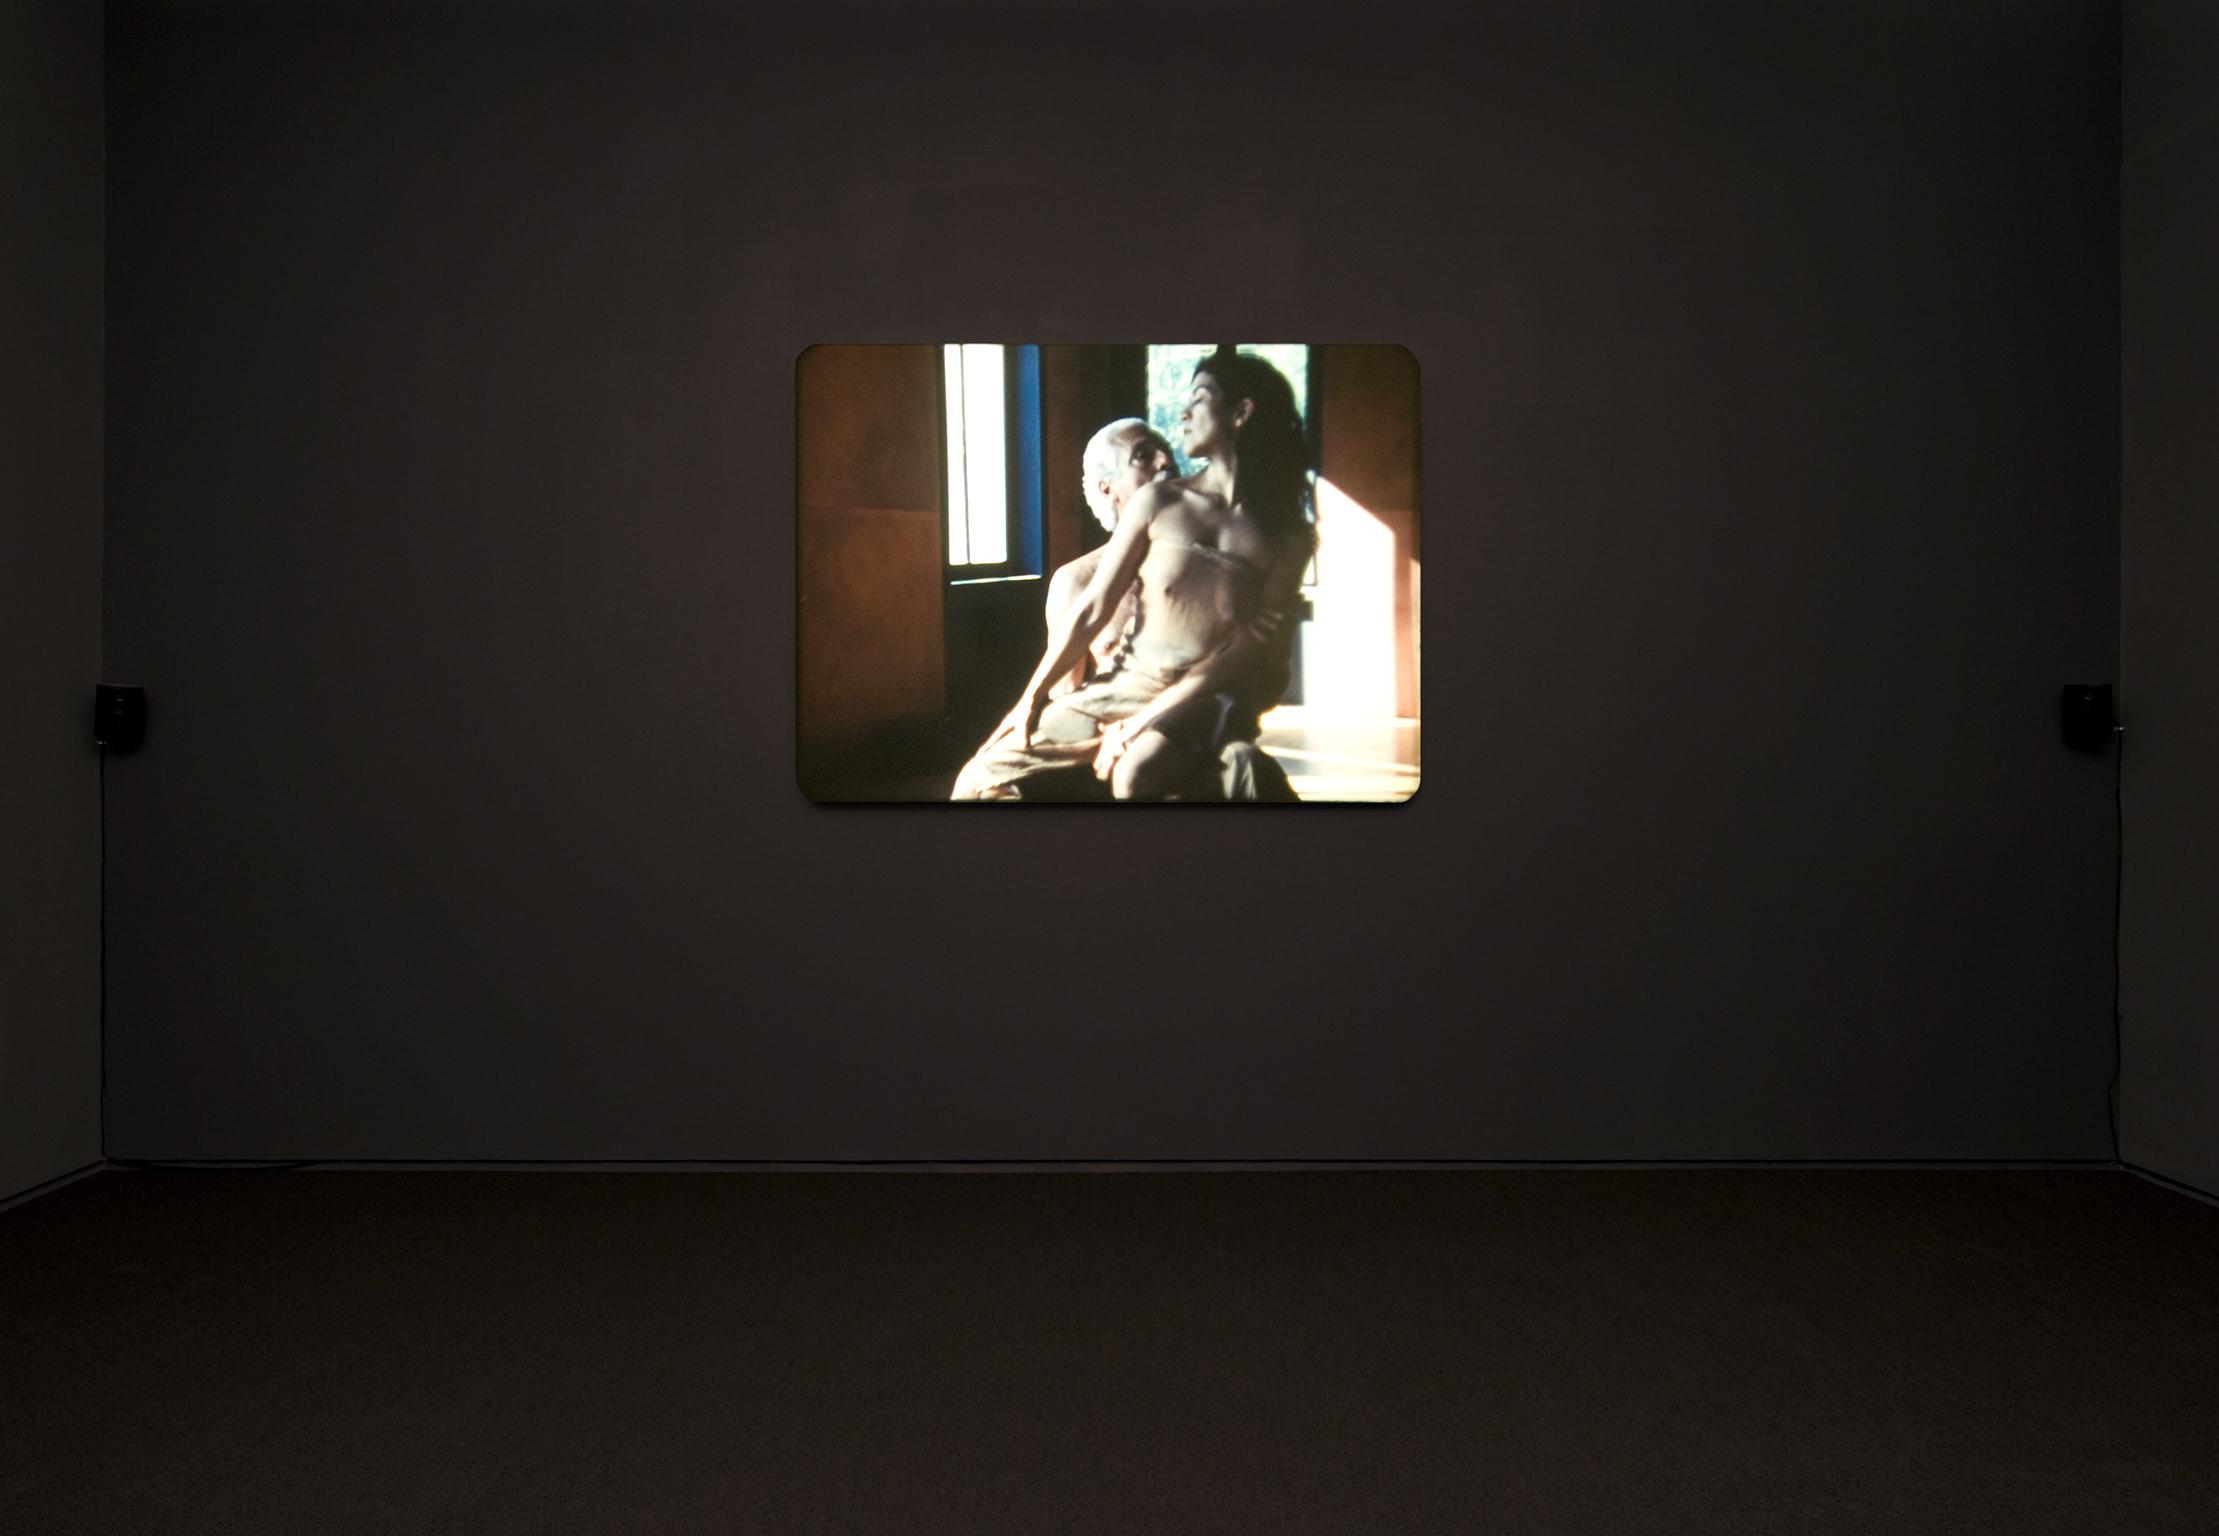 Daria Martin, Minotaur, 2006, 16mm film, 9 minutes by